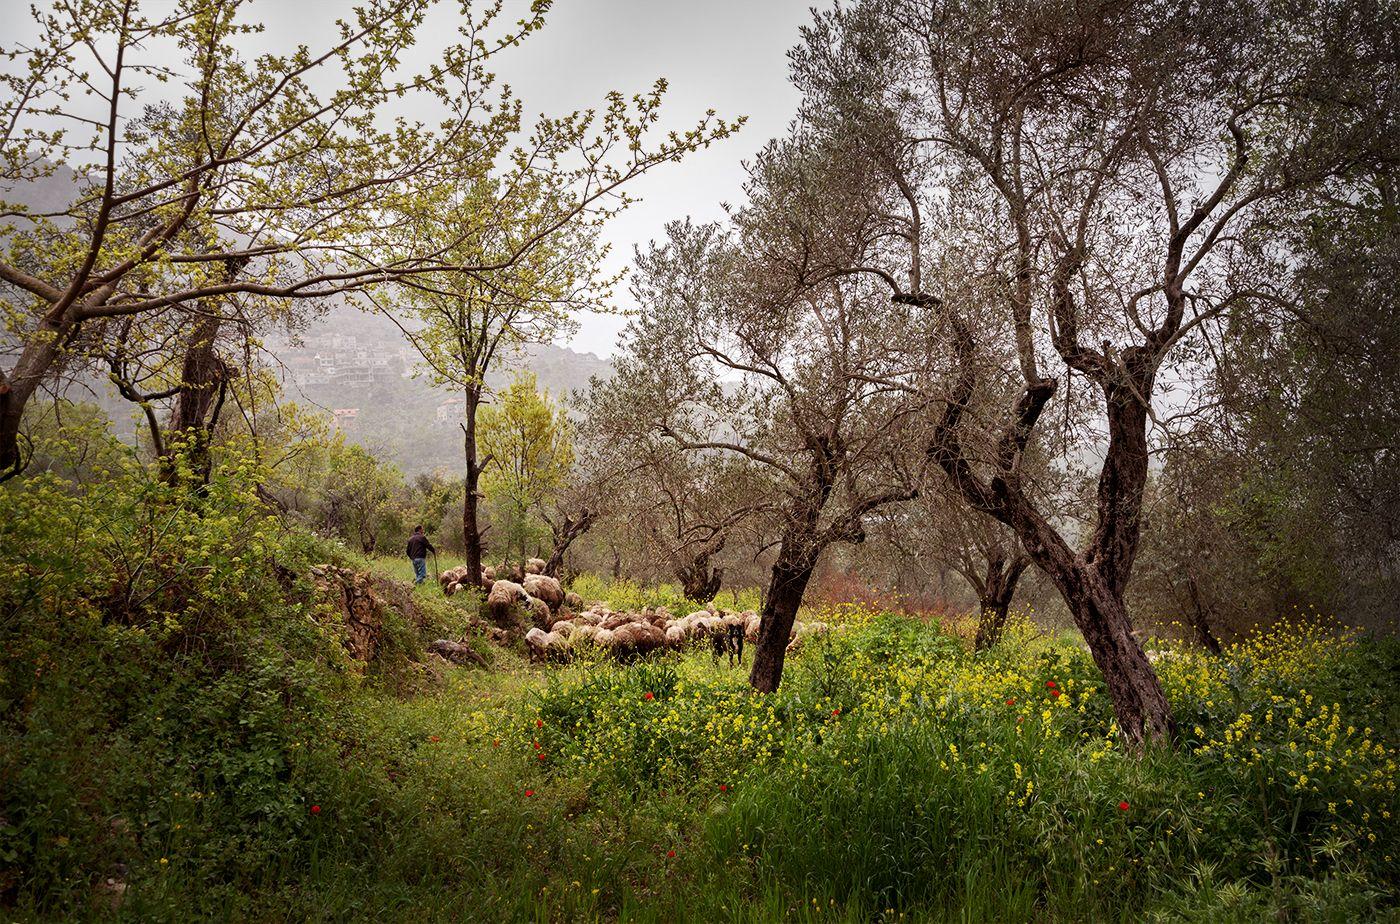 19 04 16 Spring in Moukthara valley 1 s.jpg